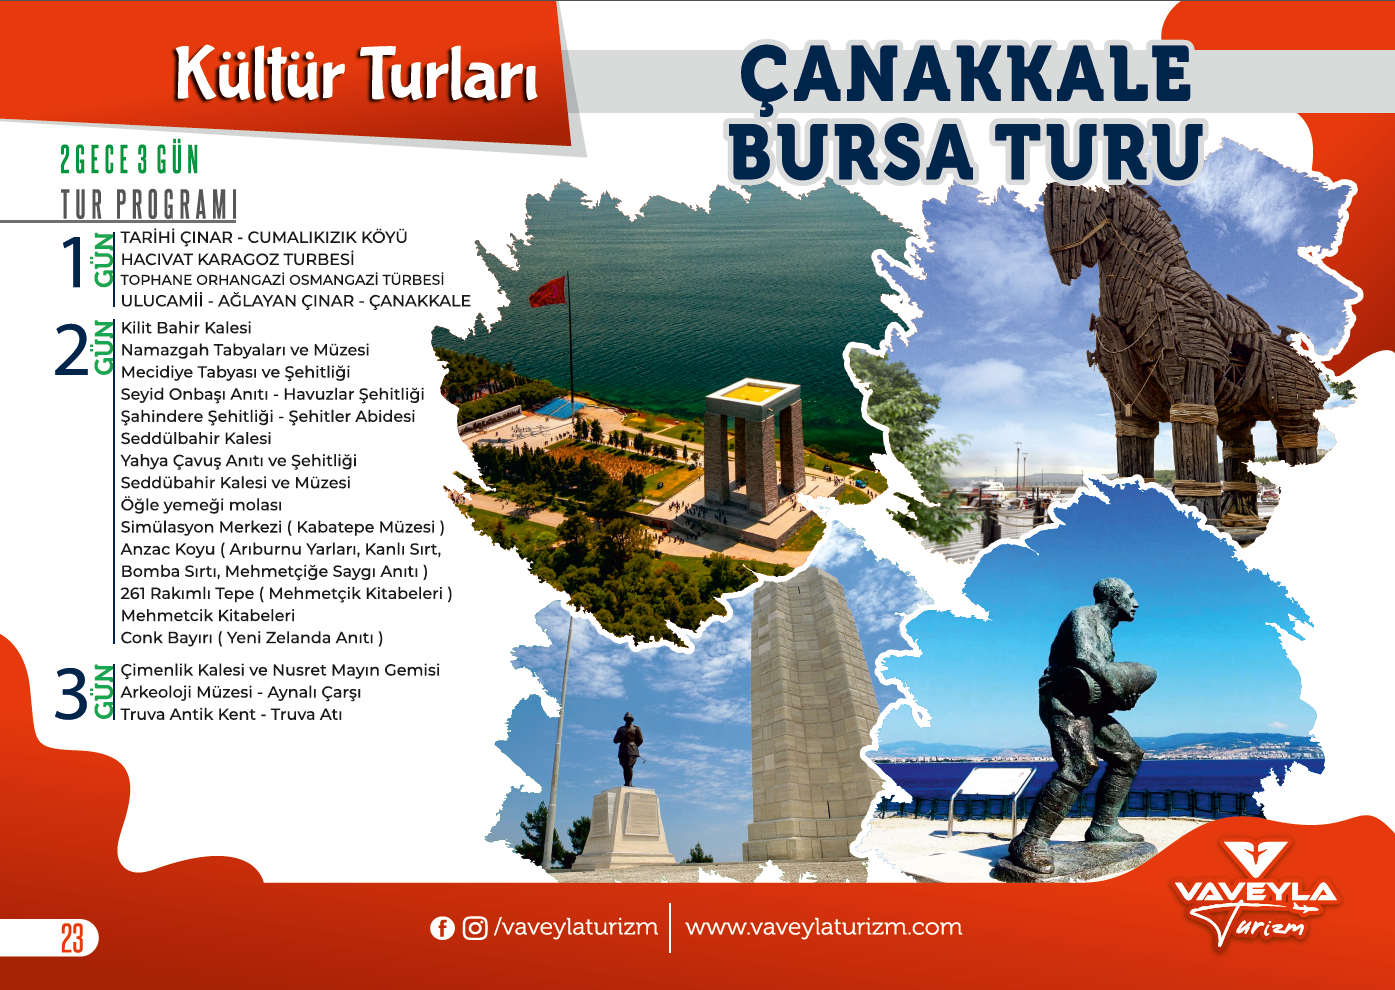 Çanakkale - Bursa Turu